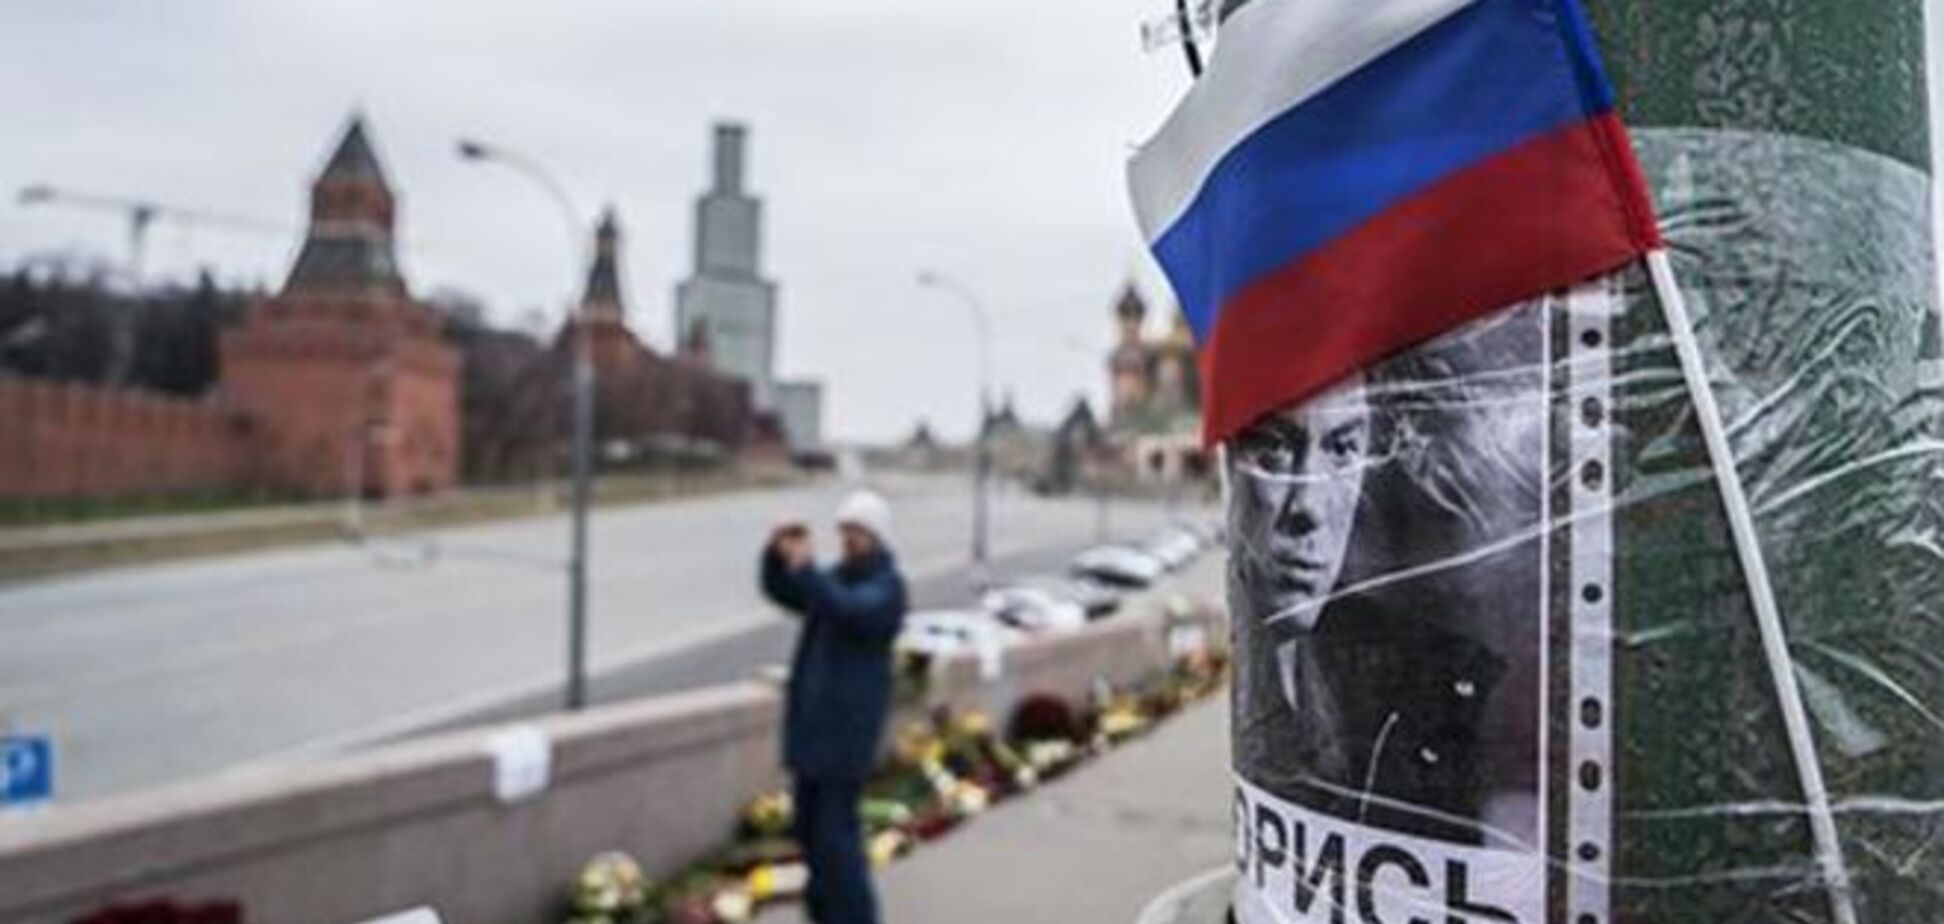 СМИ обнародовали подробности неопубликованного доклада Немцова